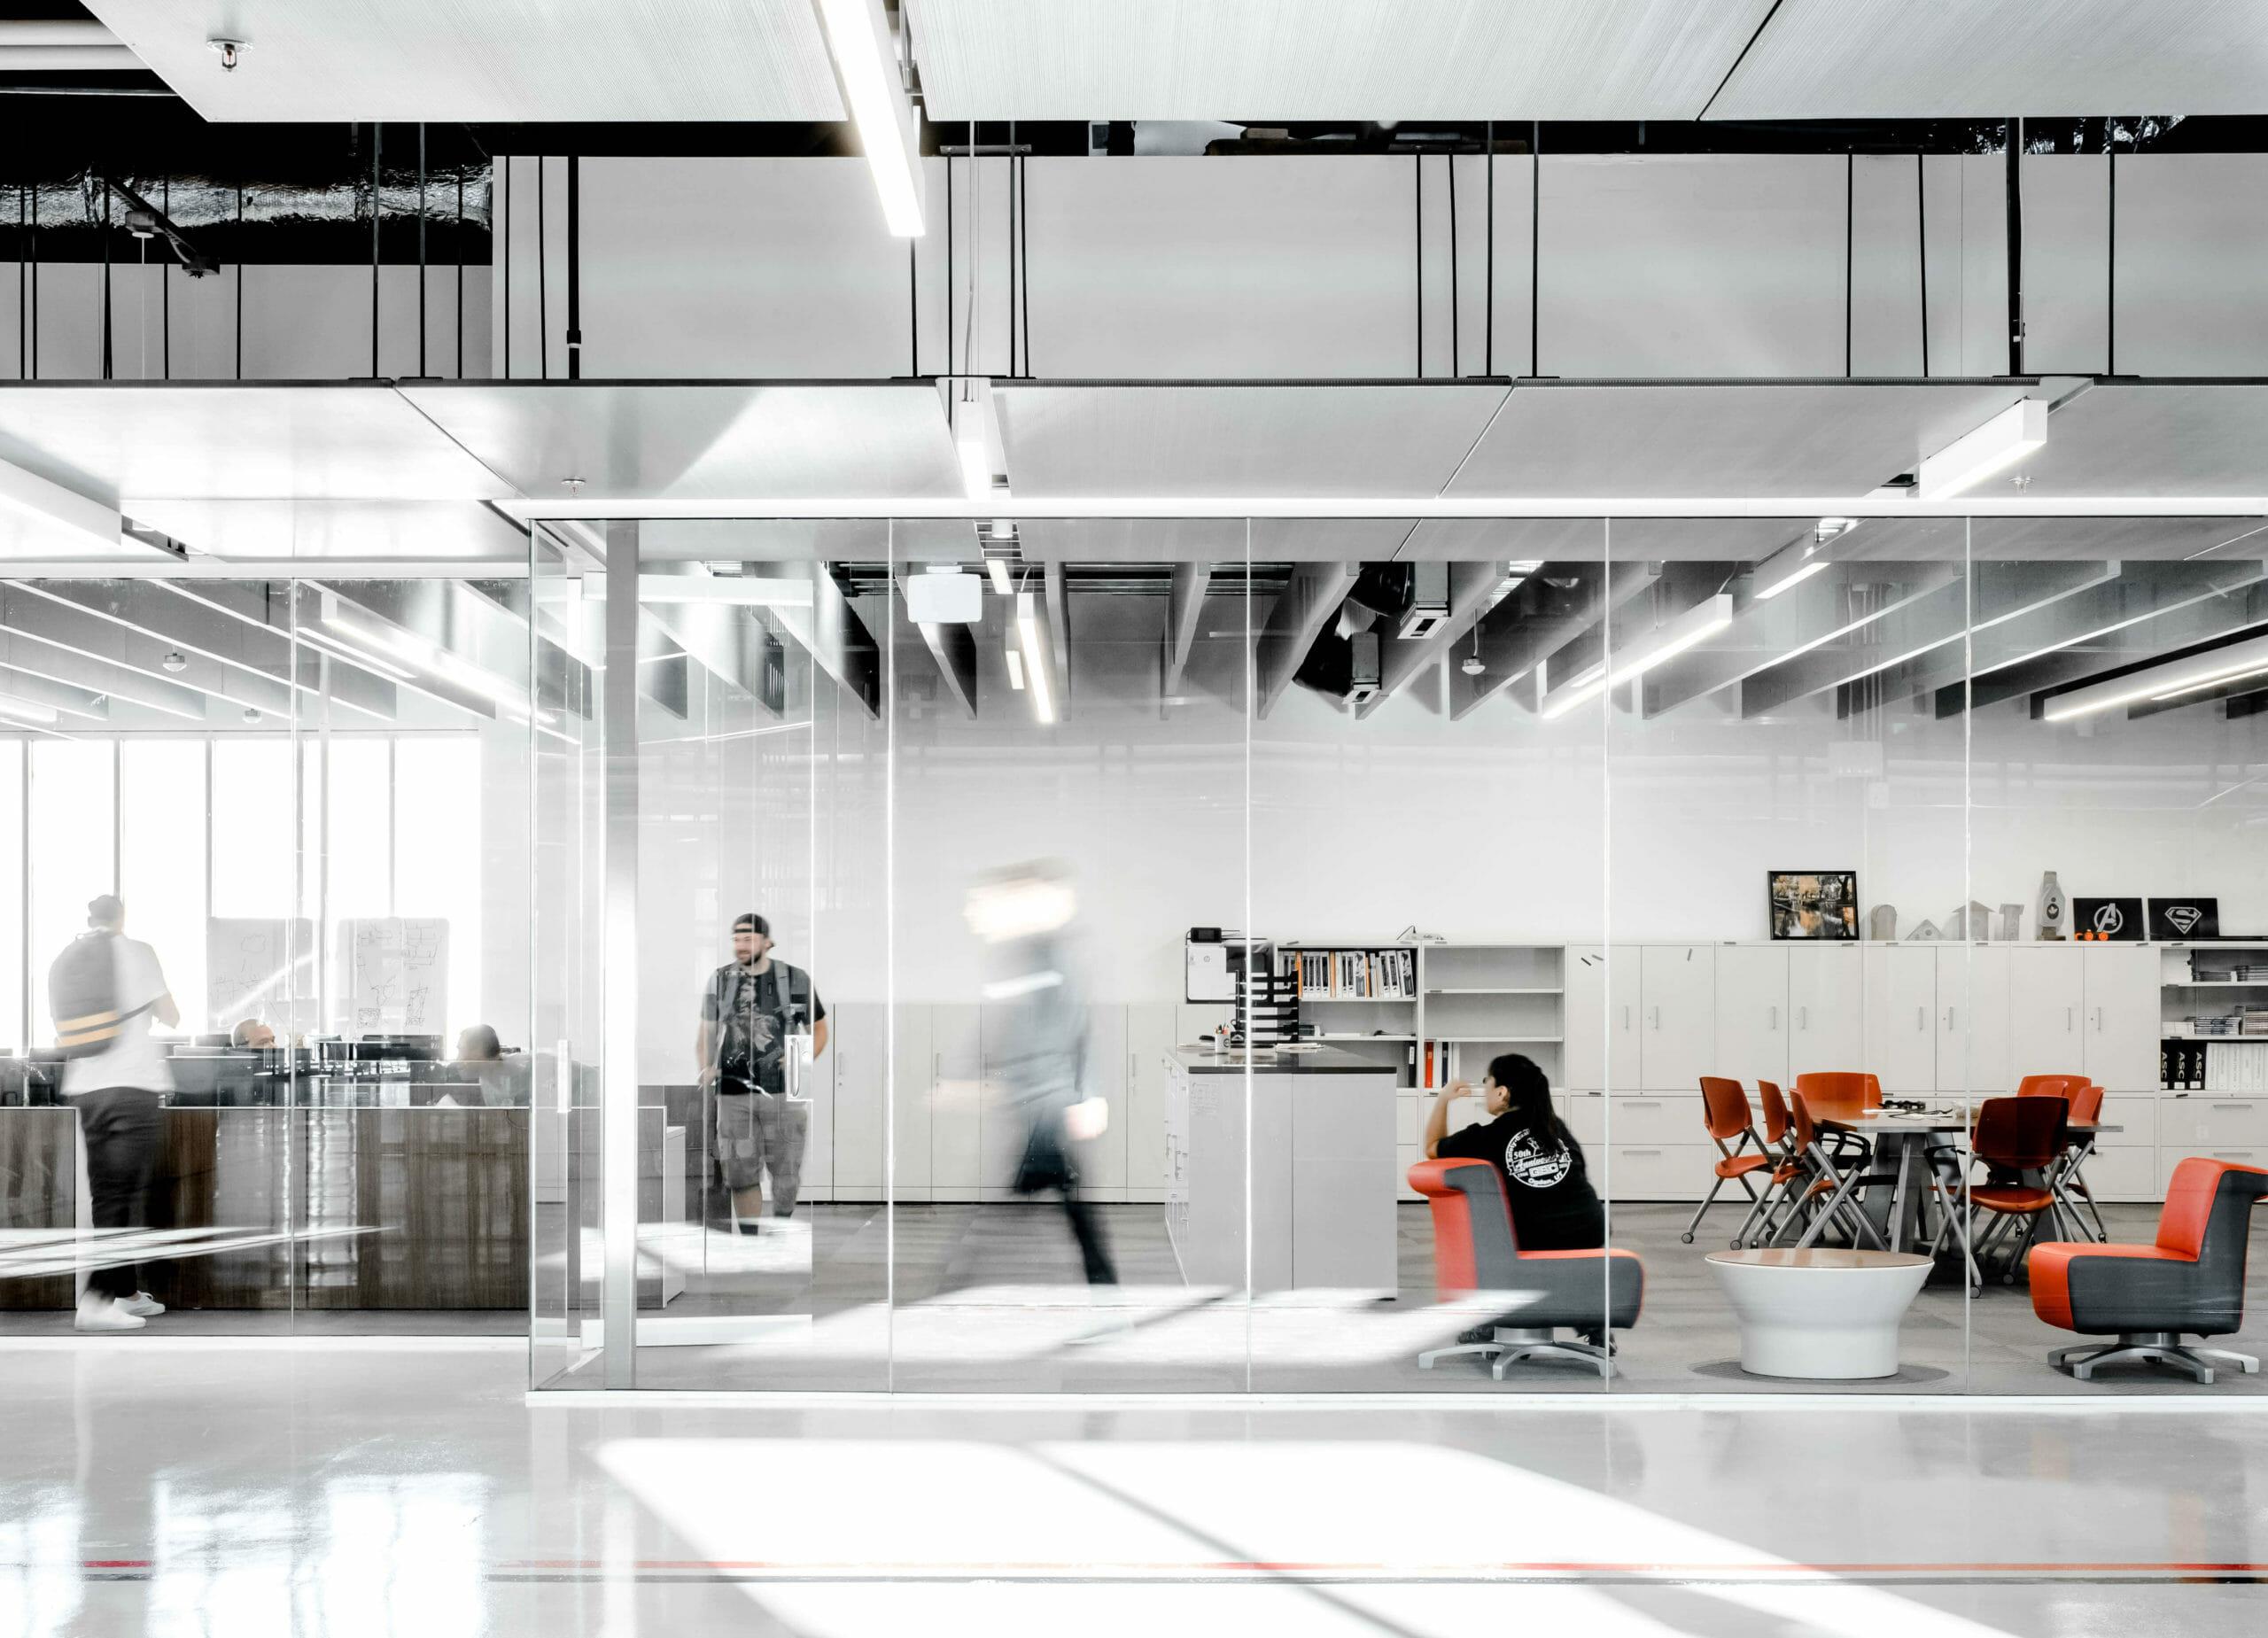 OWATC Business Depot Ogden Bay 2 Build out ajc architects